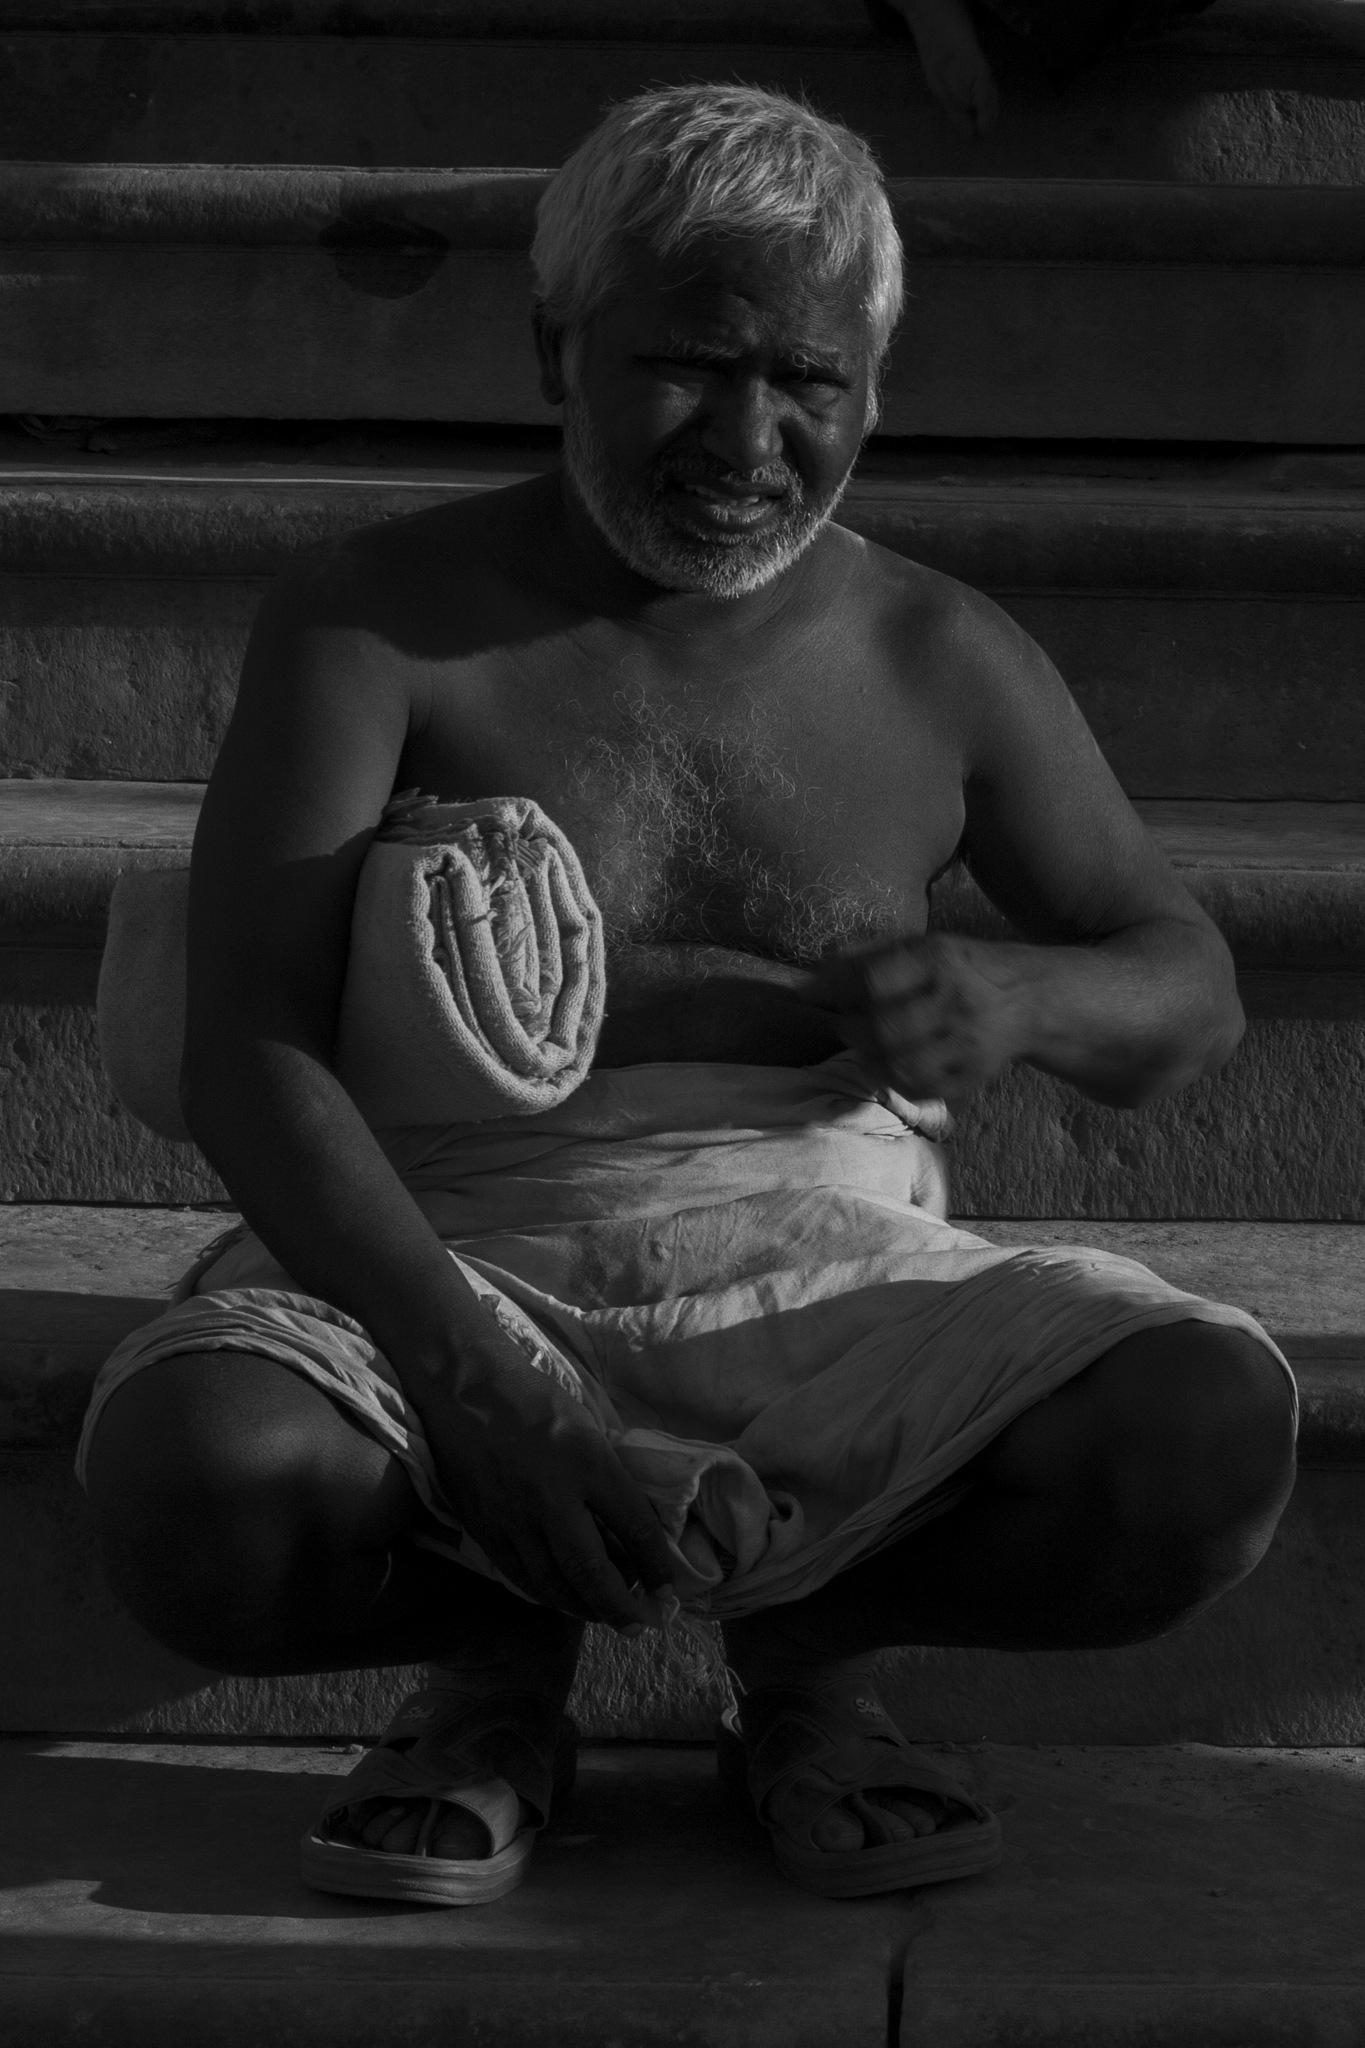 rembrand light in street by Makesh Bala Murugan